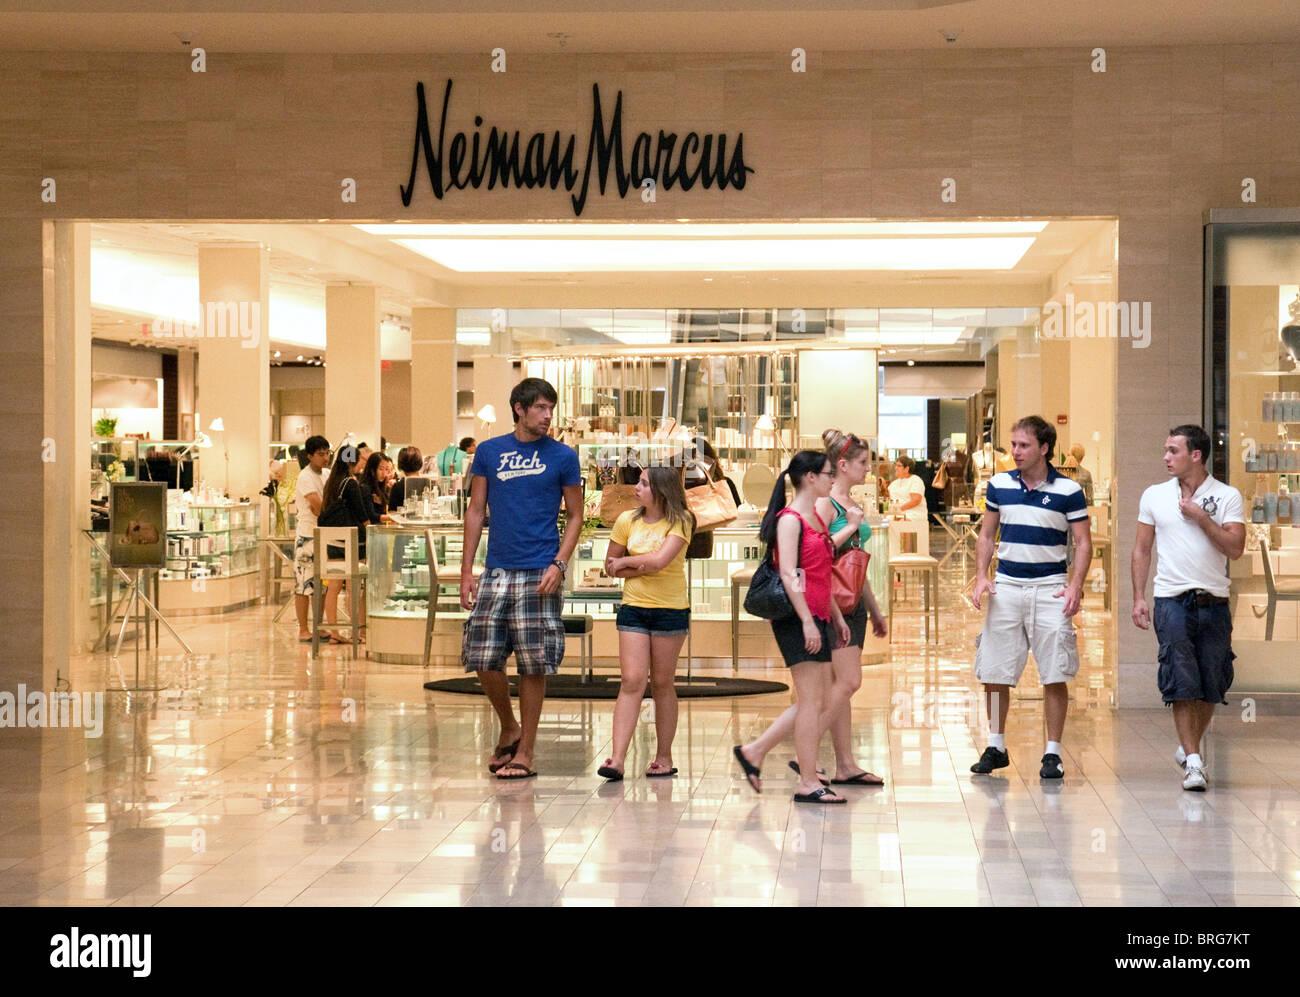 Neiman Marcus Fashion Show Mall Las Vegas